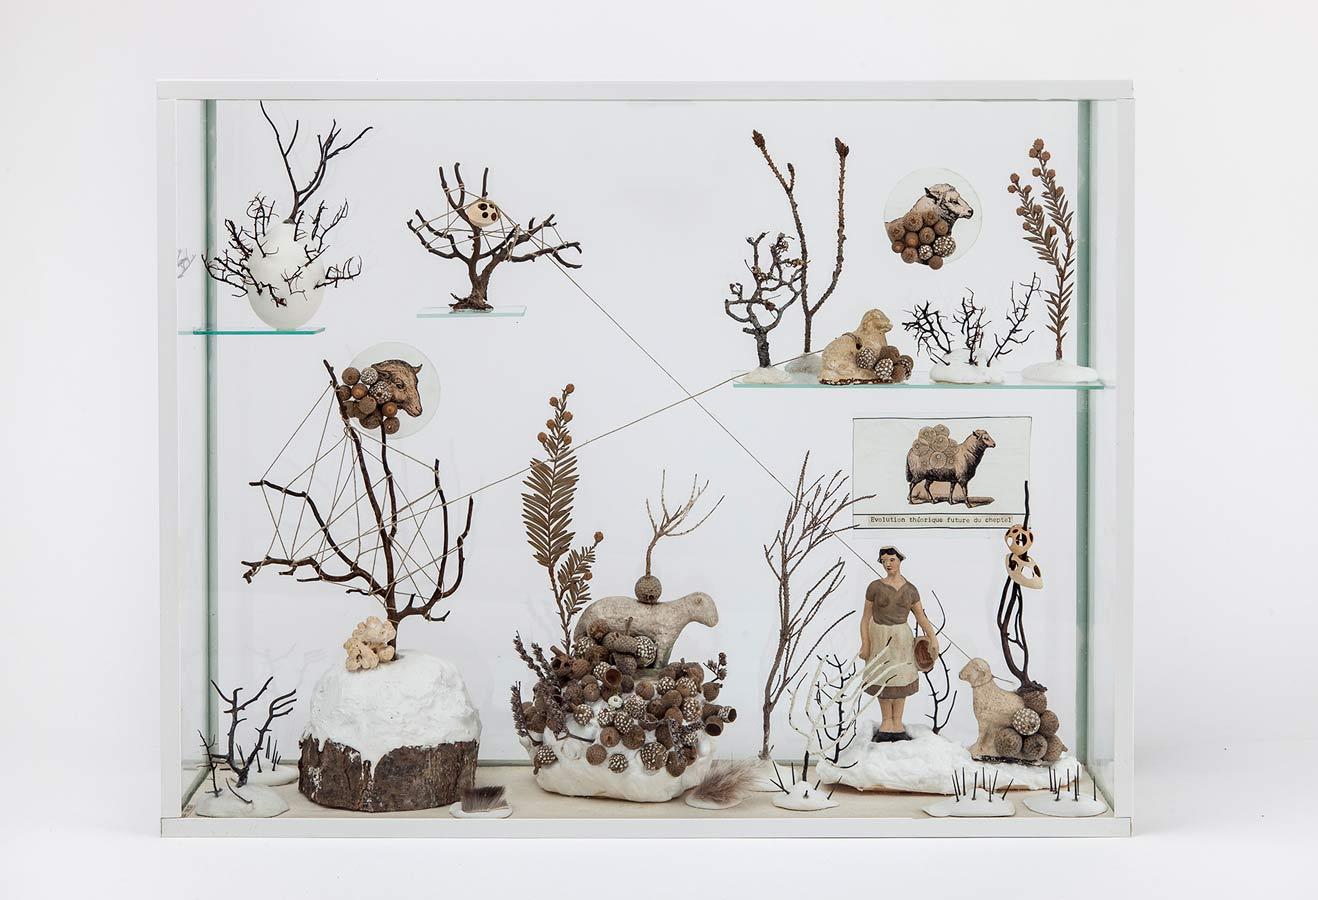 Nature morte delicatessen studiodelicatessen studio - La villa c une creation du studio guilhem guilhem ...